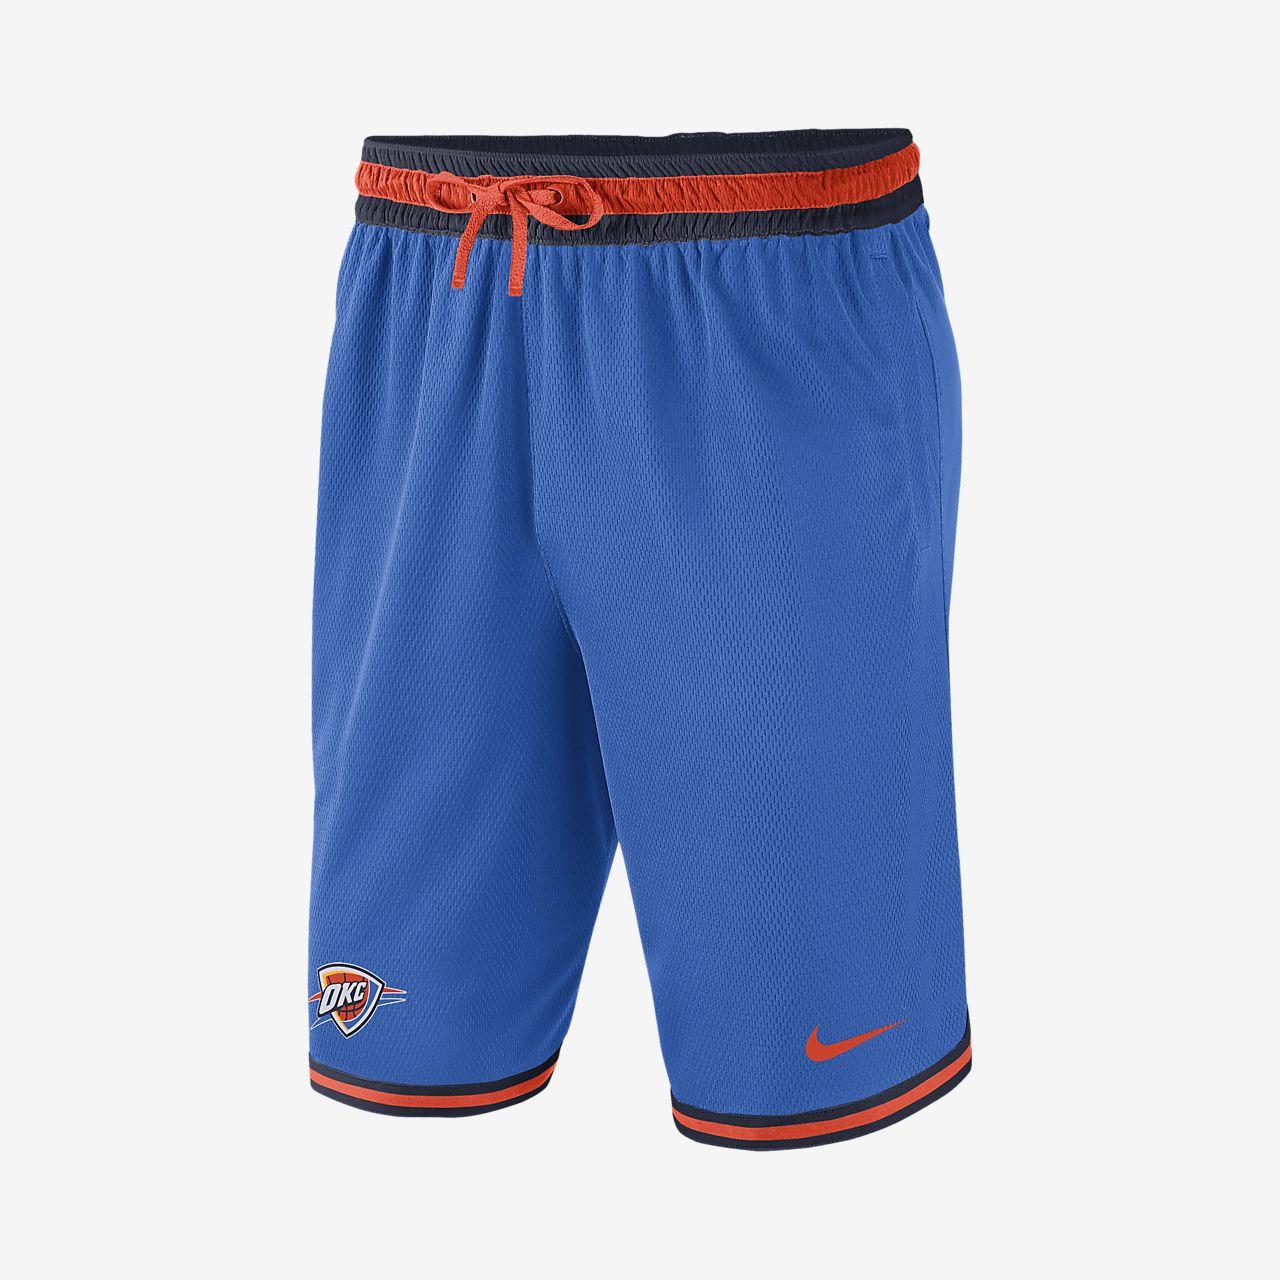 Short NBA Oklahoma City Thunder Nike pour Homme